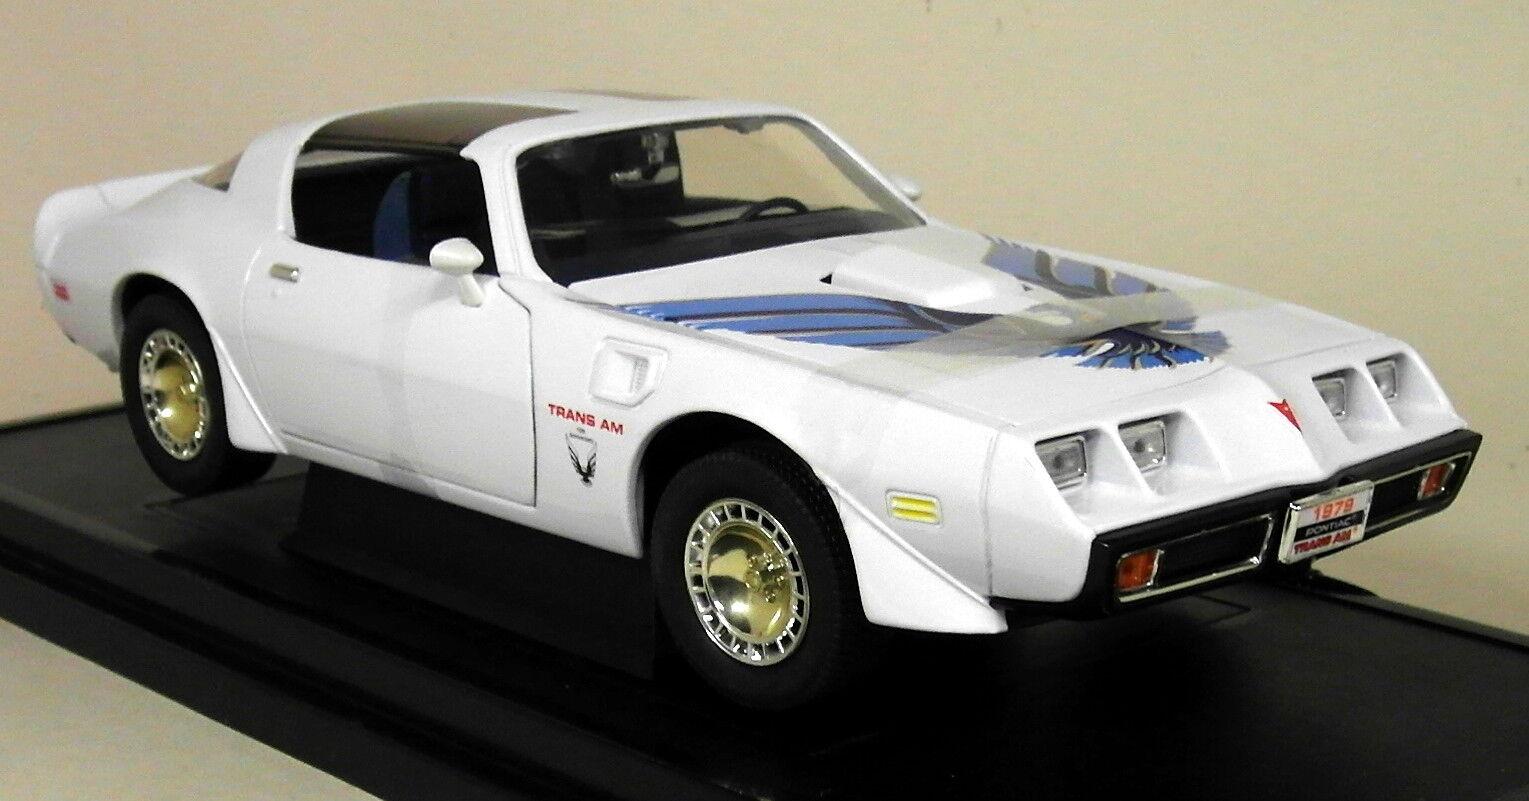 Road Signature 1 18 Scale 1979 Pontiac Firebird Trans Am White Diecast Model Car